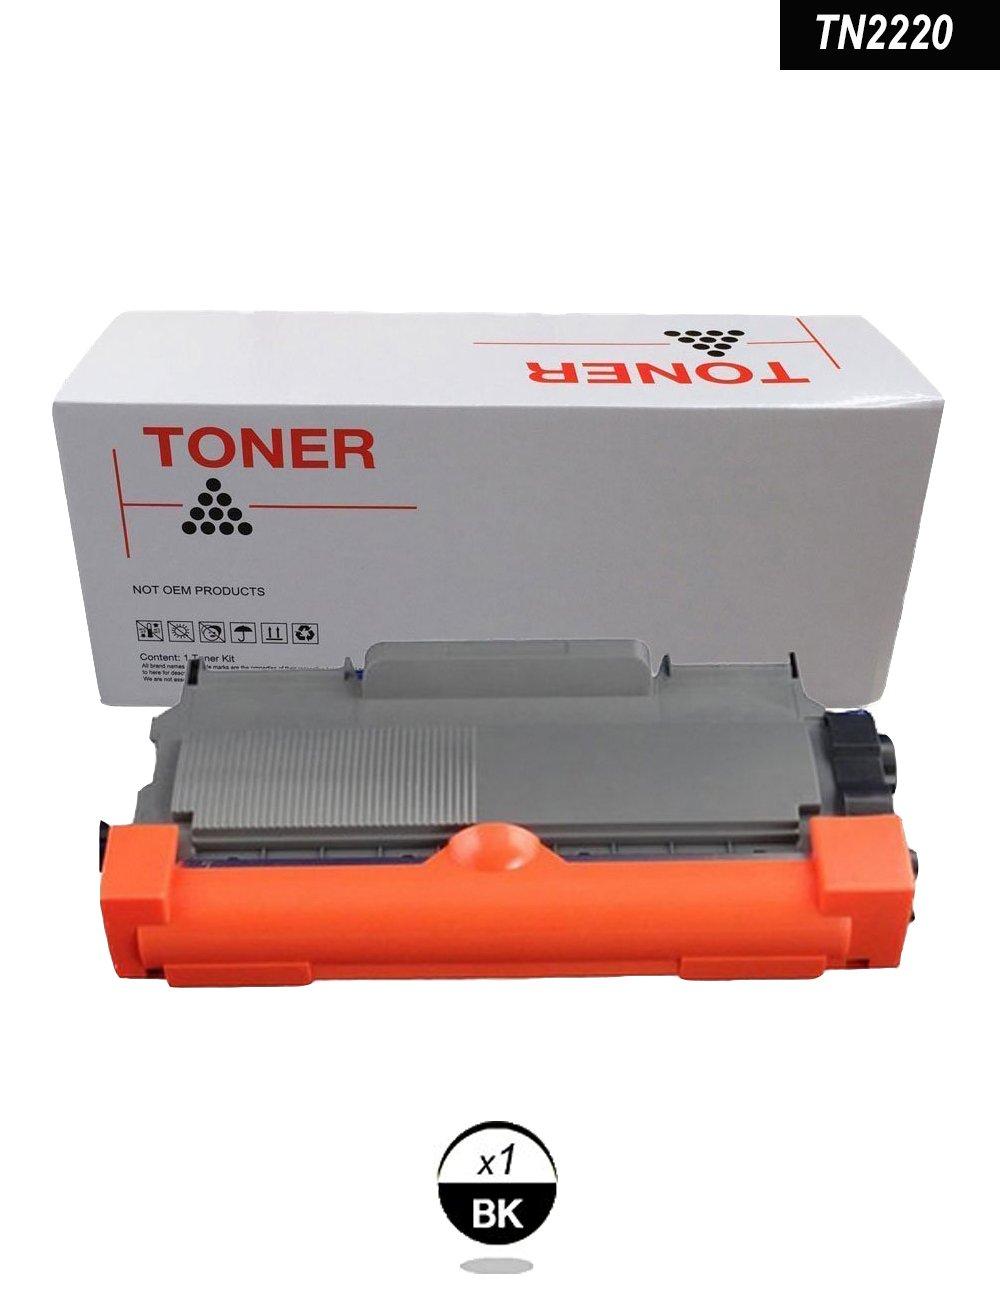 DOREE 2 x Tóners compatibles con Brother Tn-2220/2010- NON OEM ...